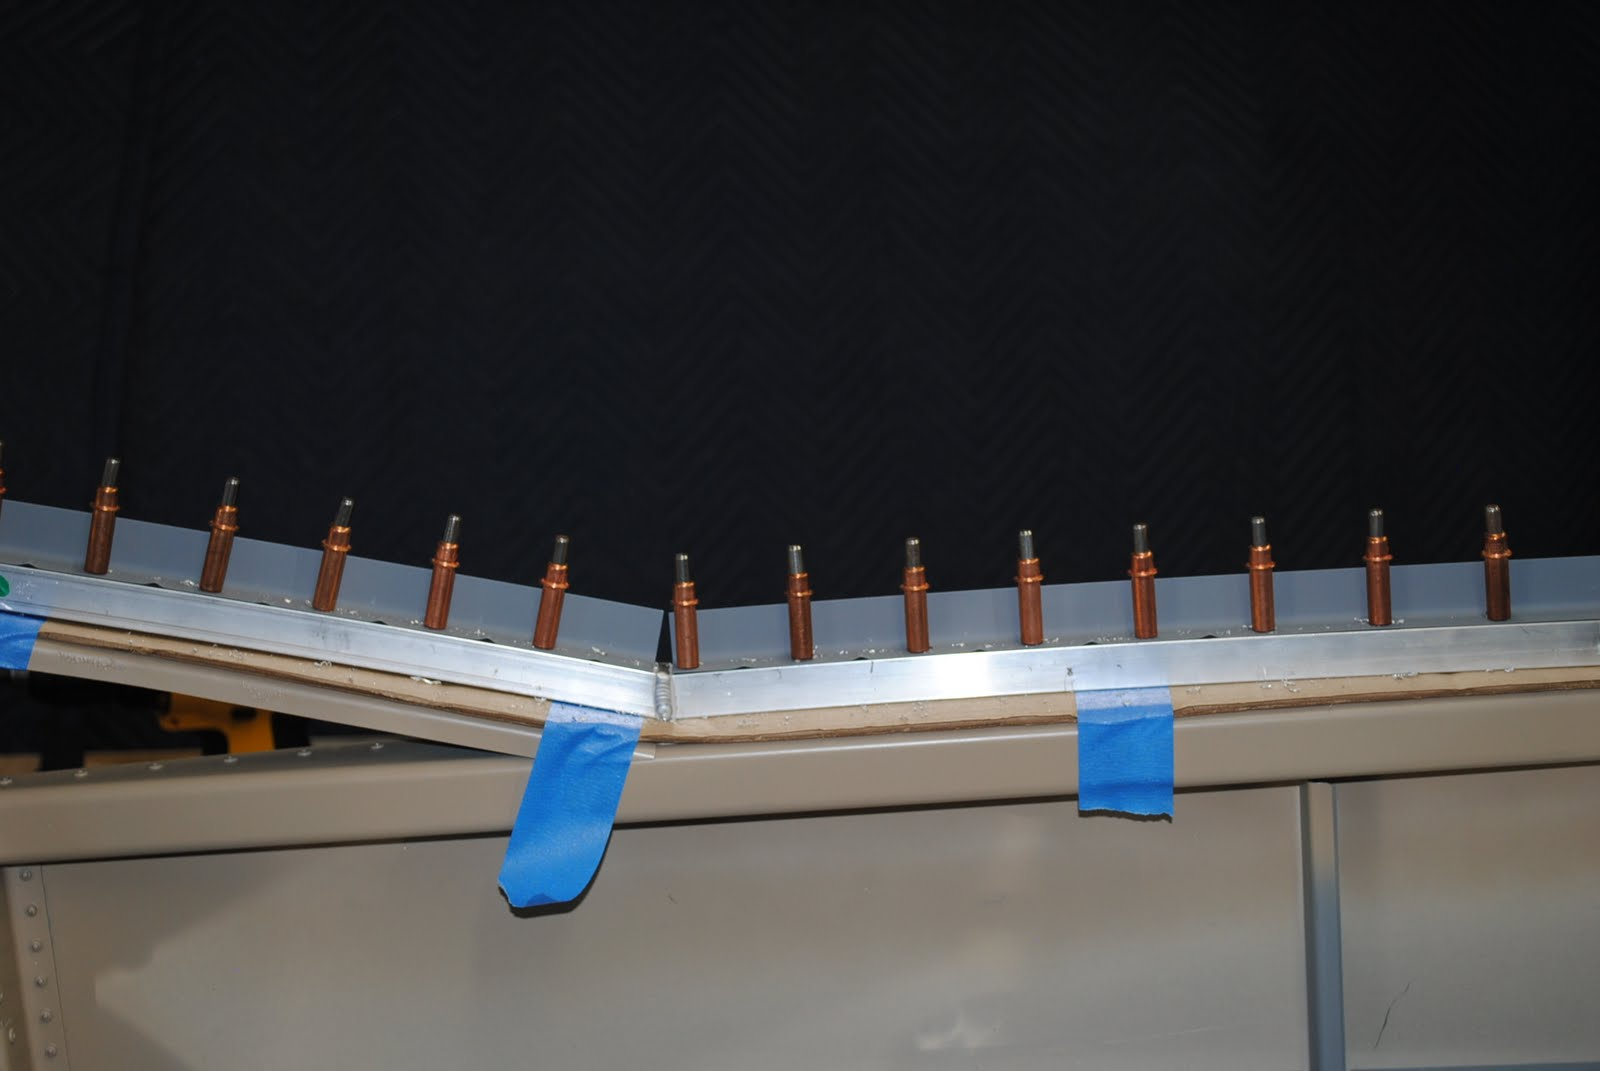 Rivet Canopy Attach Angles & RV-12 Builder in Sandy UT: Rivet Canopy Attach Angles